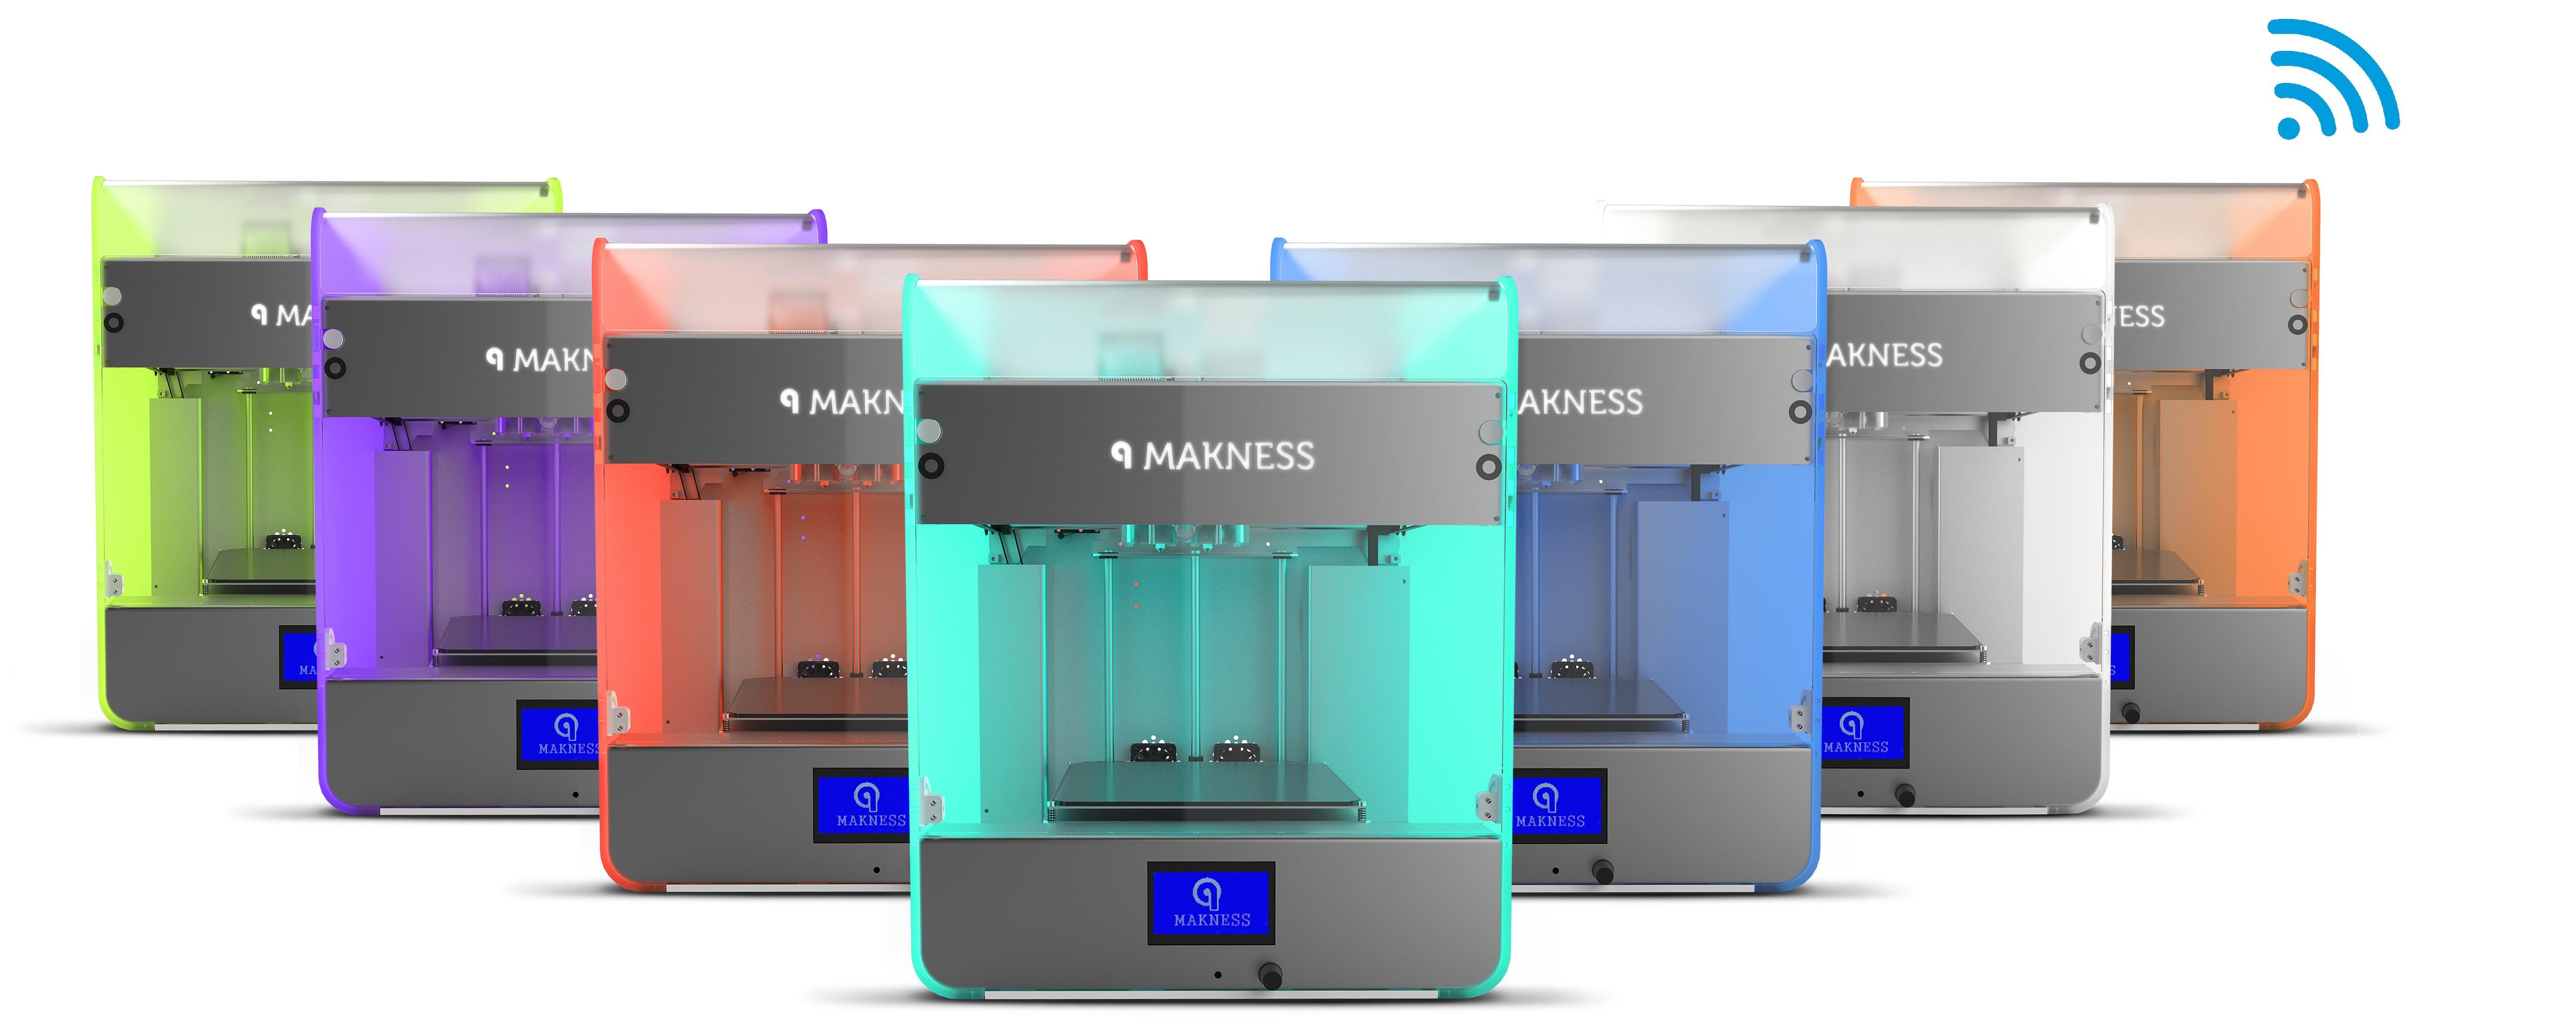 makness 3d drucker mki - Makness stellt MK I Dual-Extruder Desktop 3D-Drucker mit Filament-Kapsel-System vor